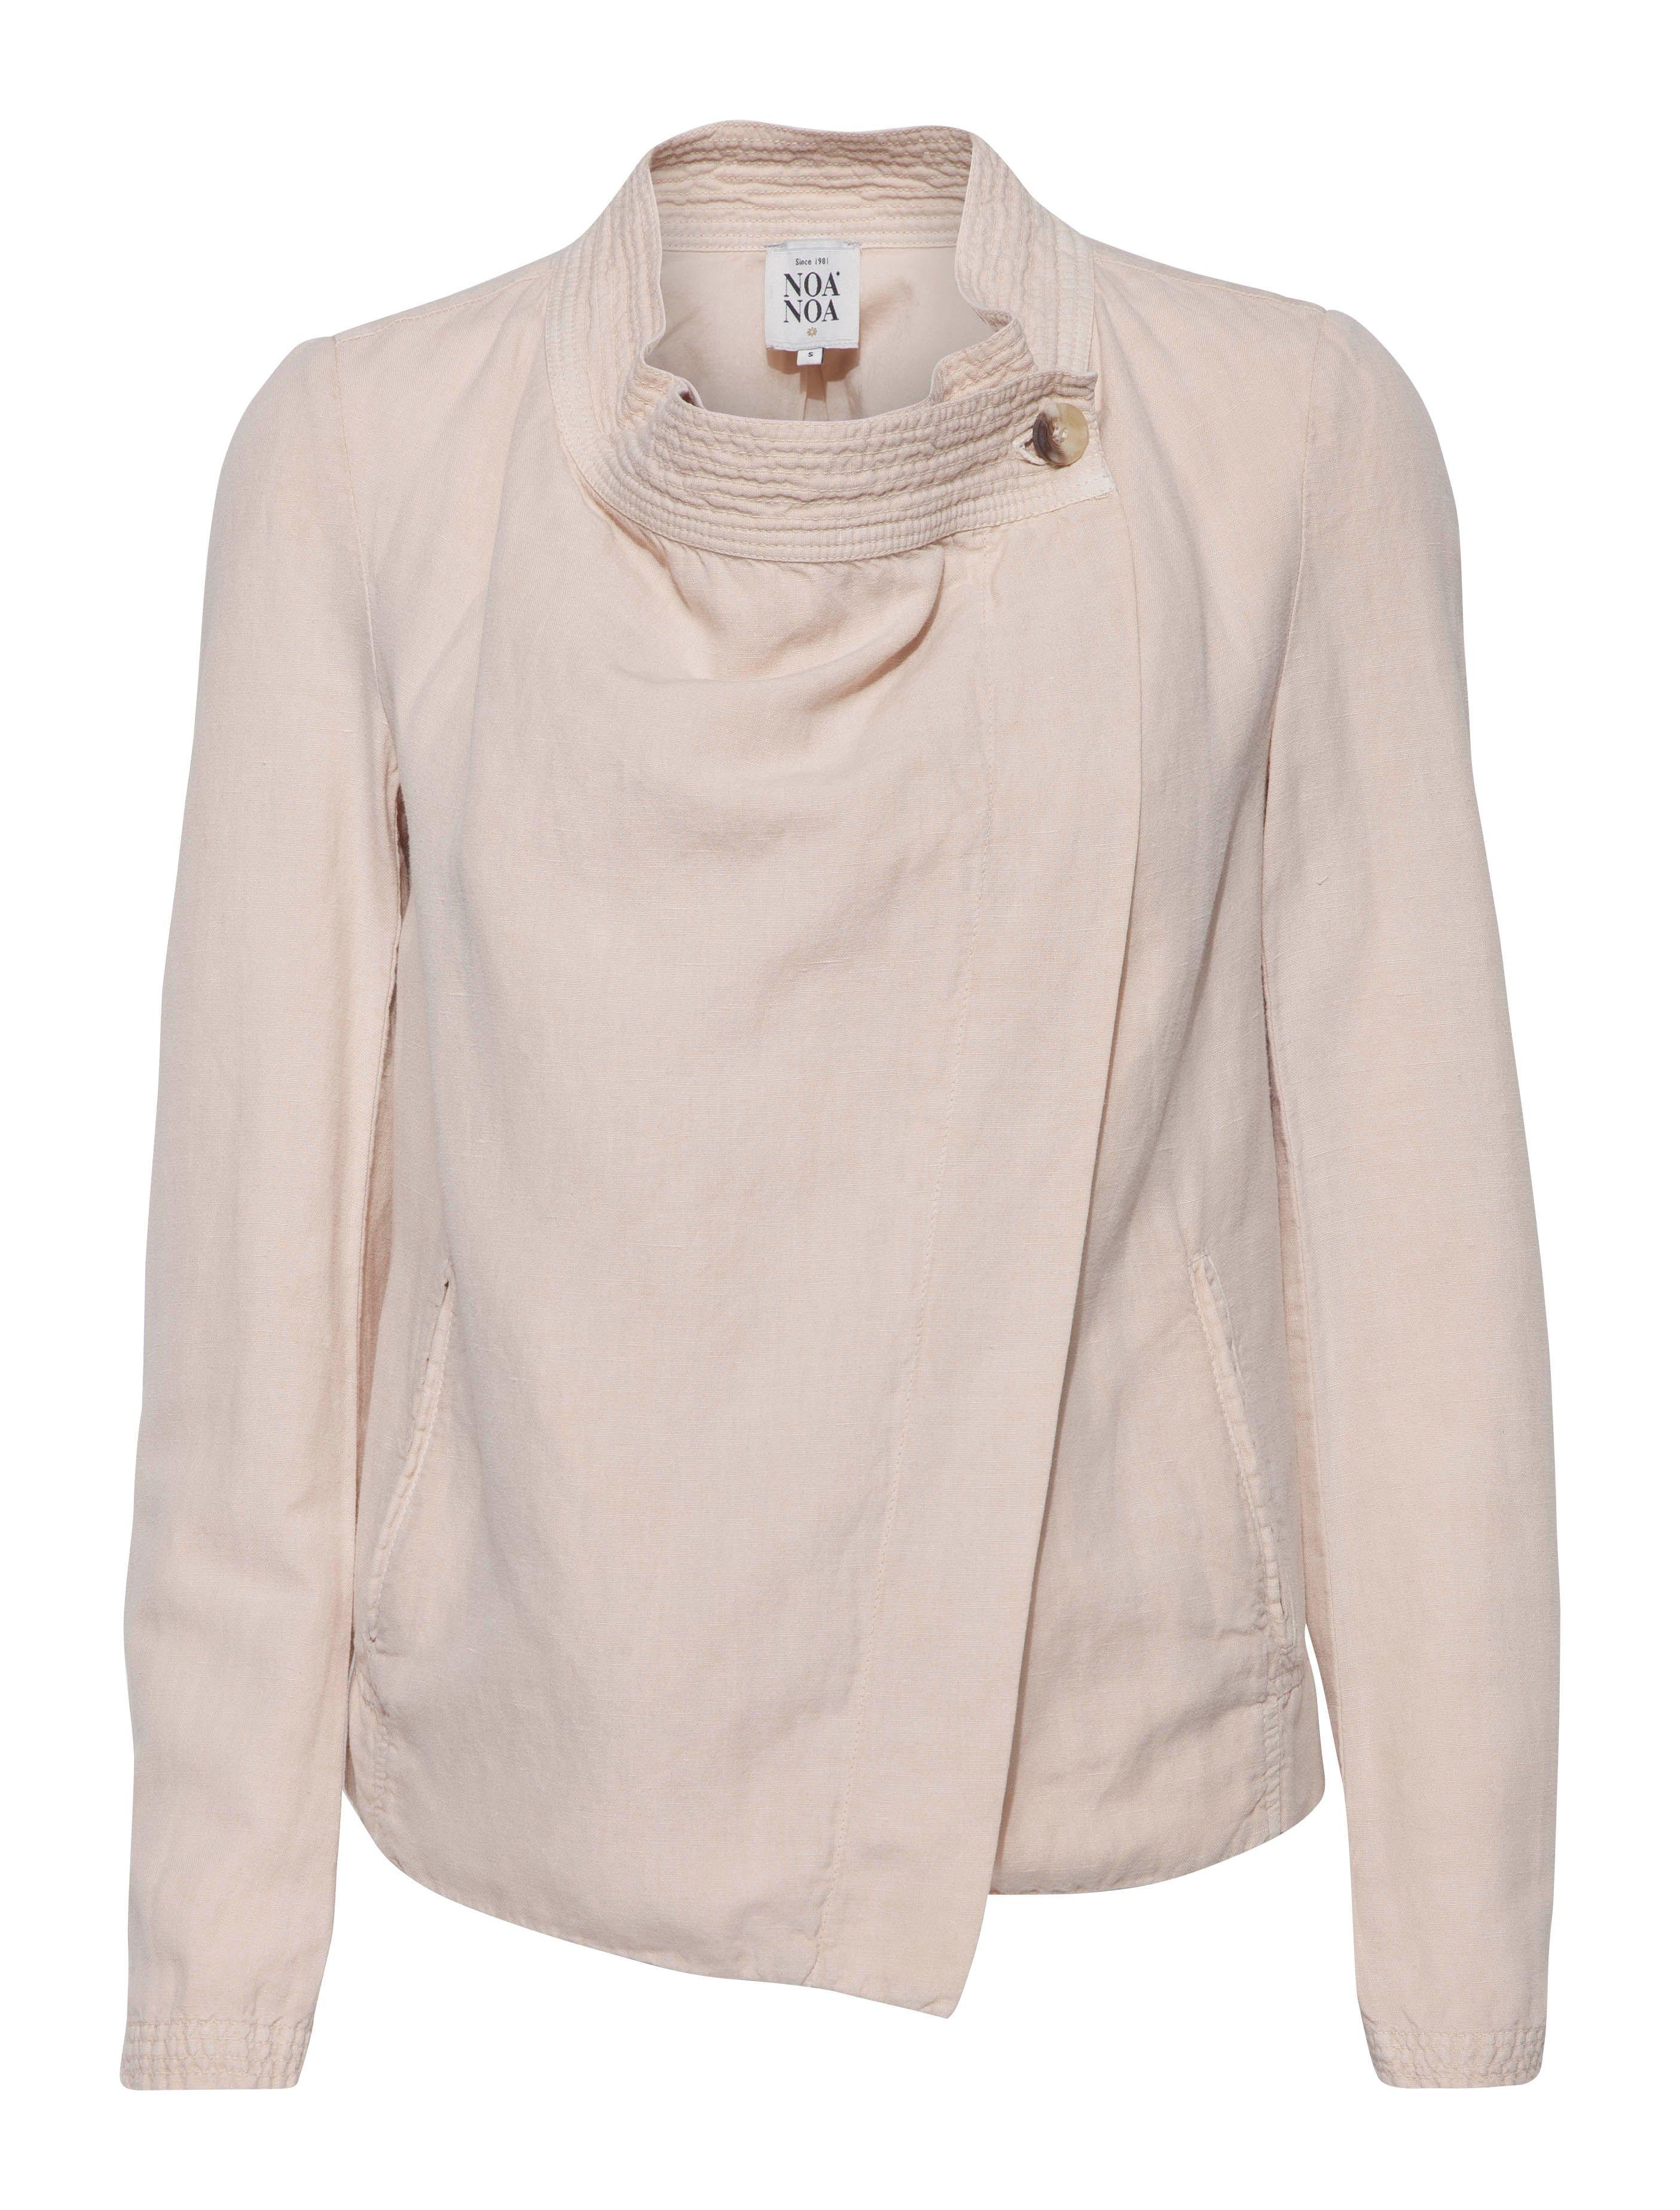 Noa noa Washed Linen Jacket Long Sleeve in Natural